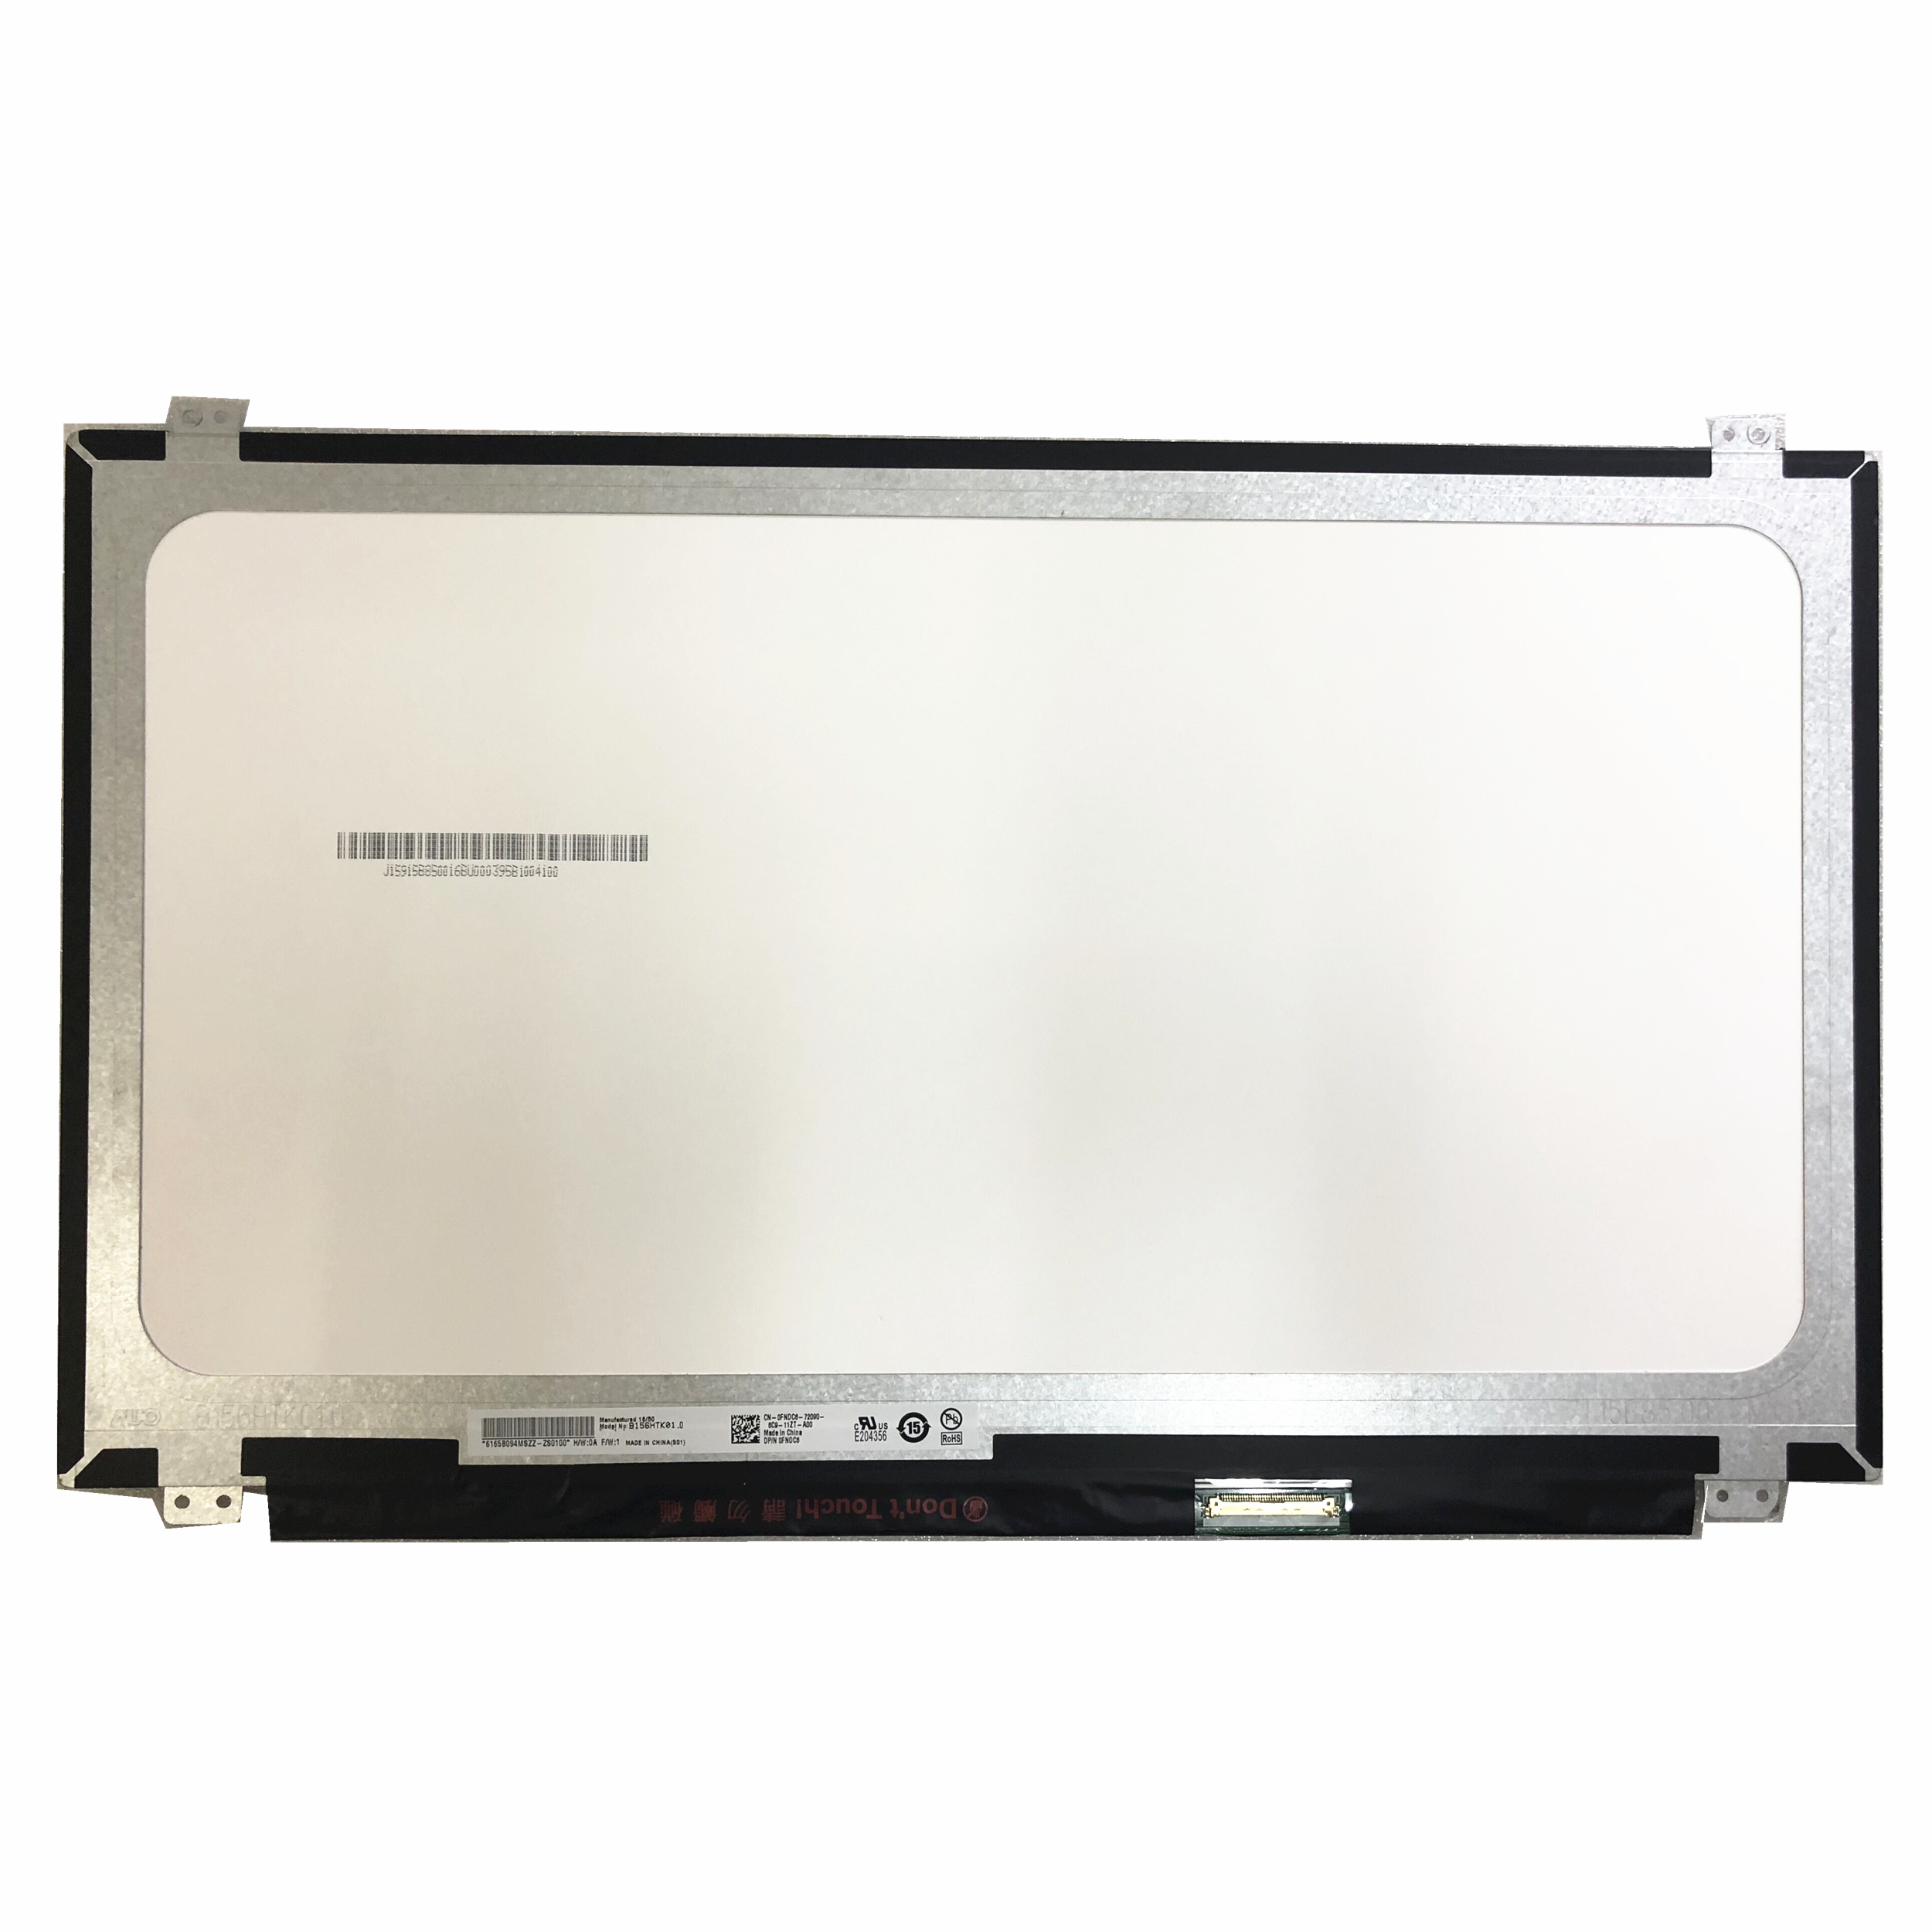 B156HTK01.0 15.6 Laptop Lcd Led Touch Screen Digitizer 1920*1080 EDP 40 PINB156HTK01.0 15.6 Laptop Lcd Led Touch Screen Digitizer 1920*1080 EDP 40 PIN